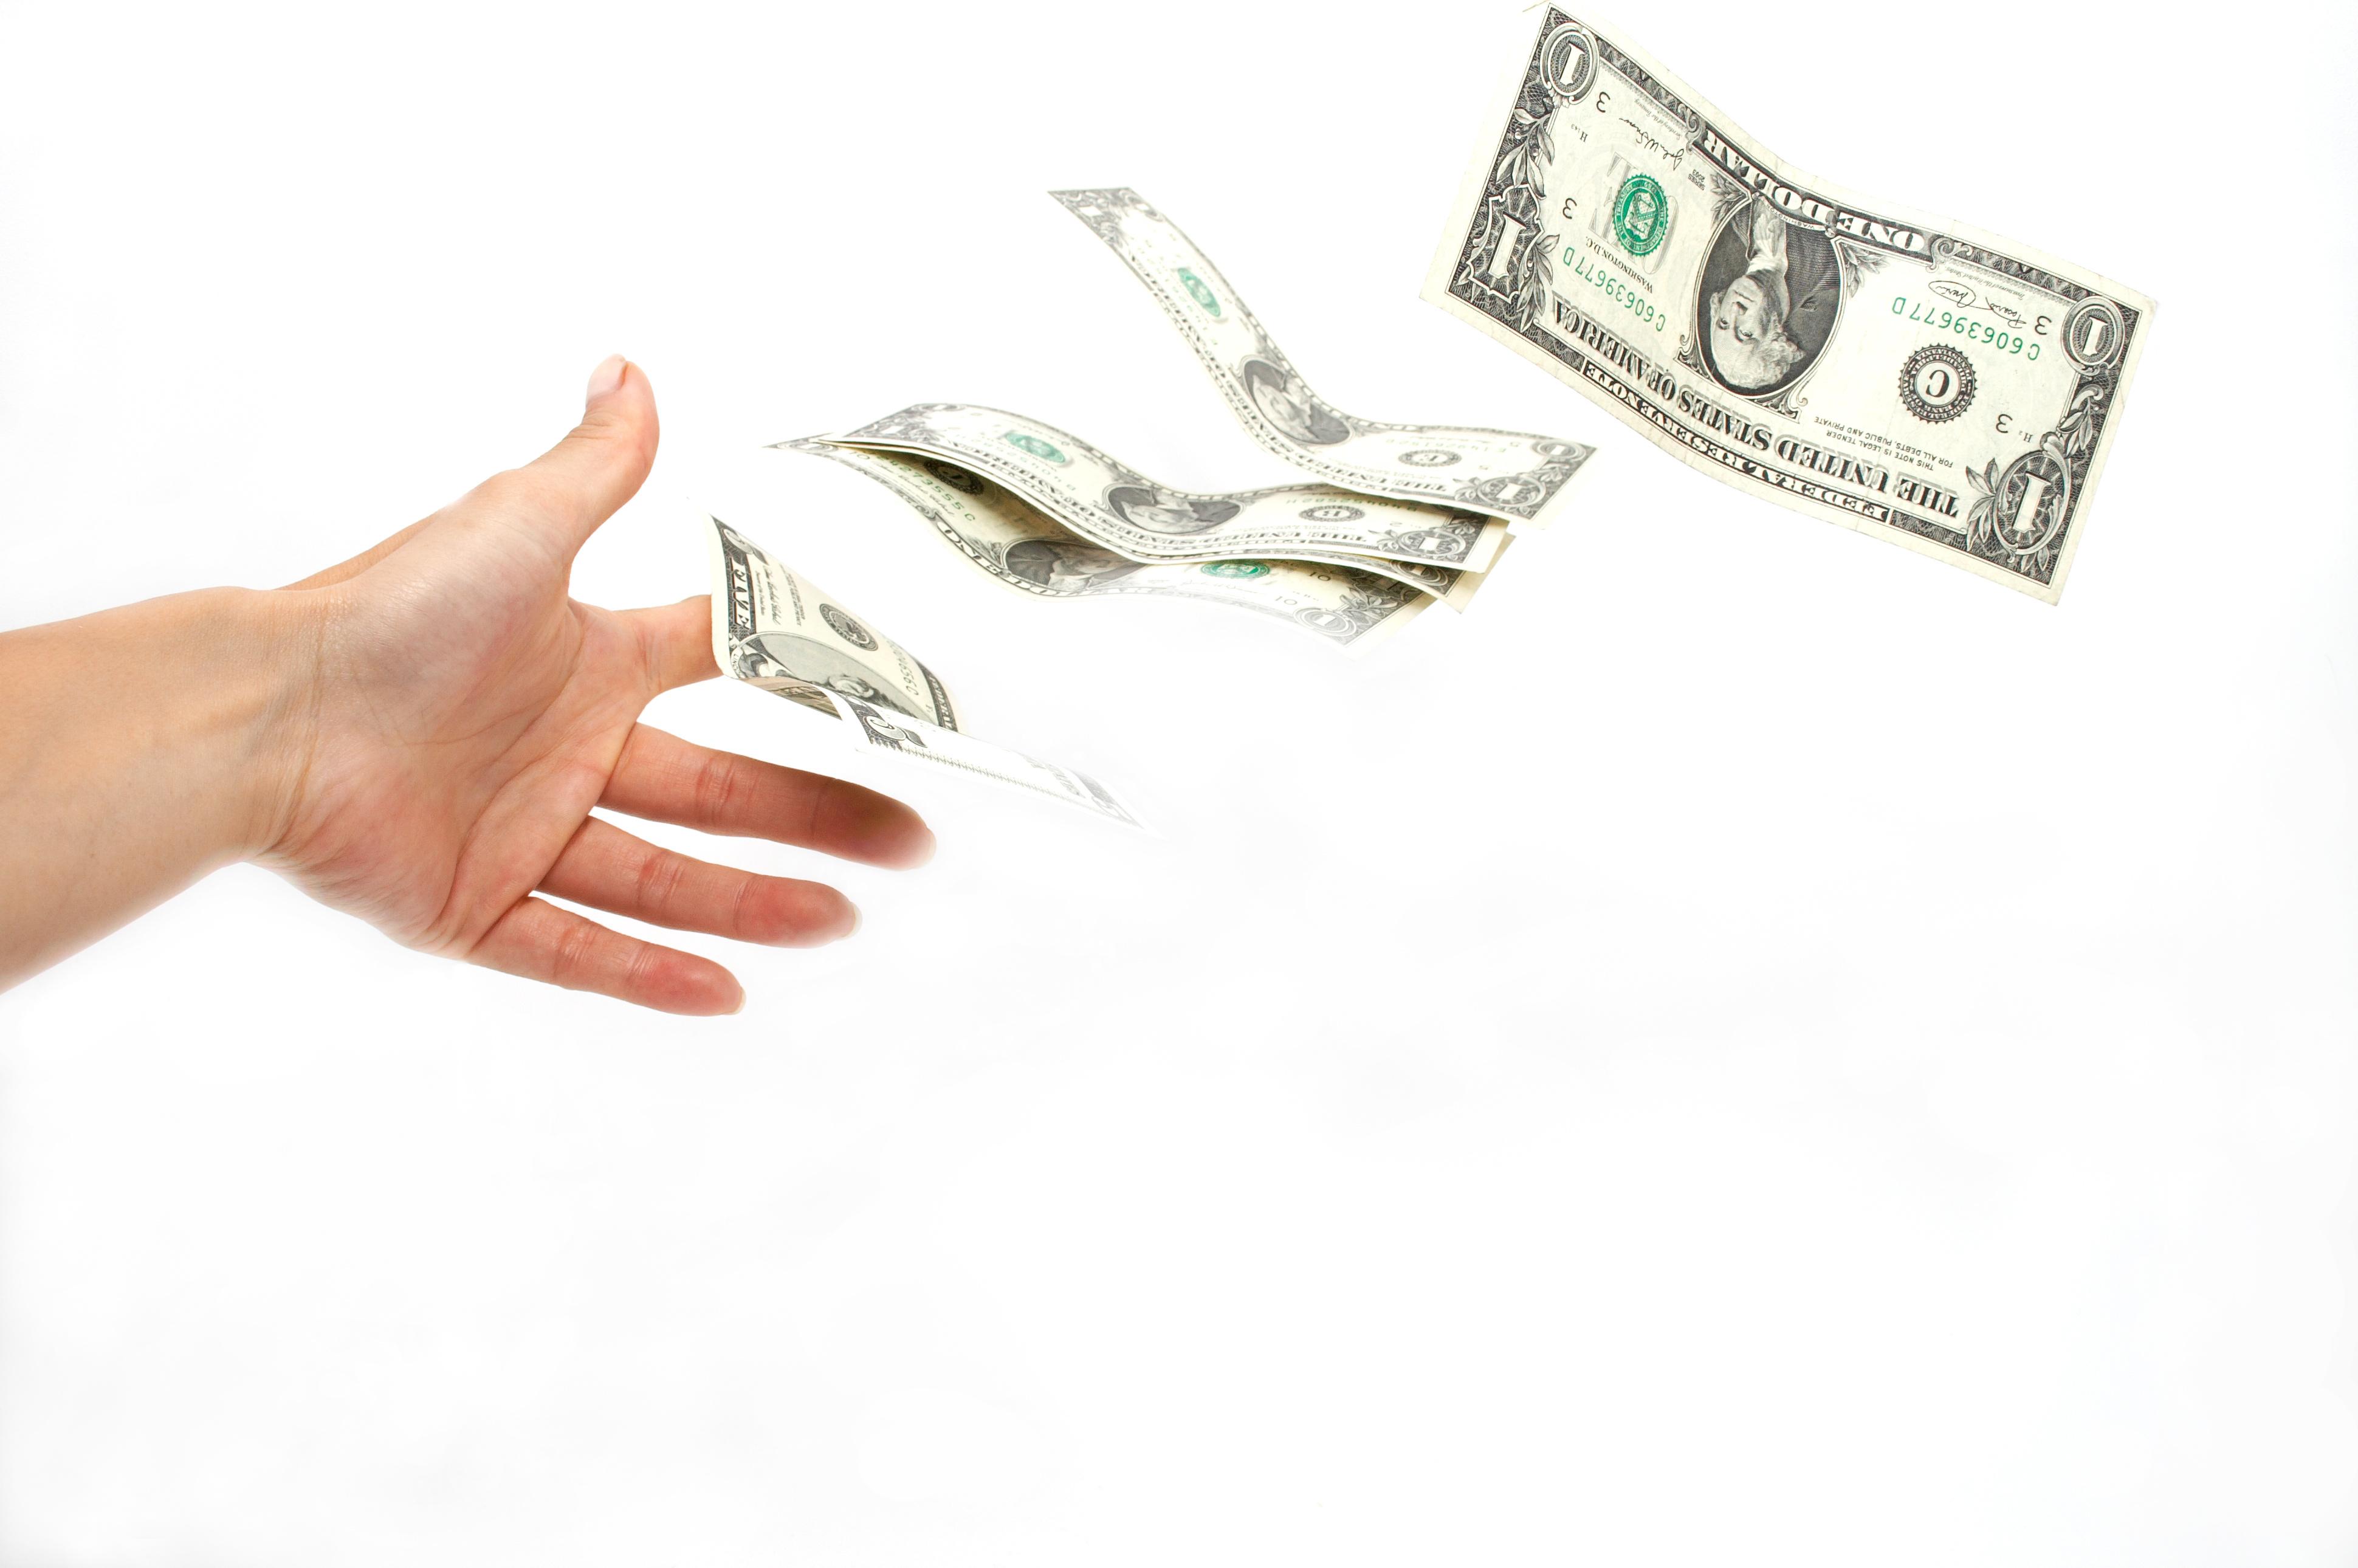 мечут деньги